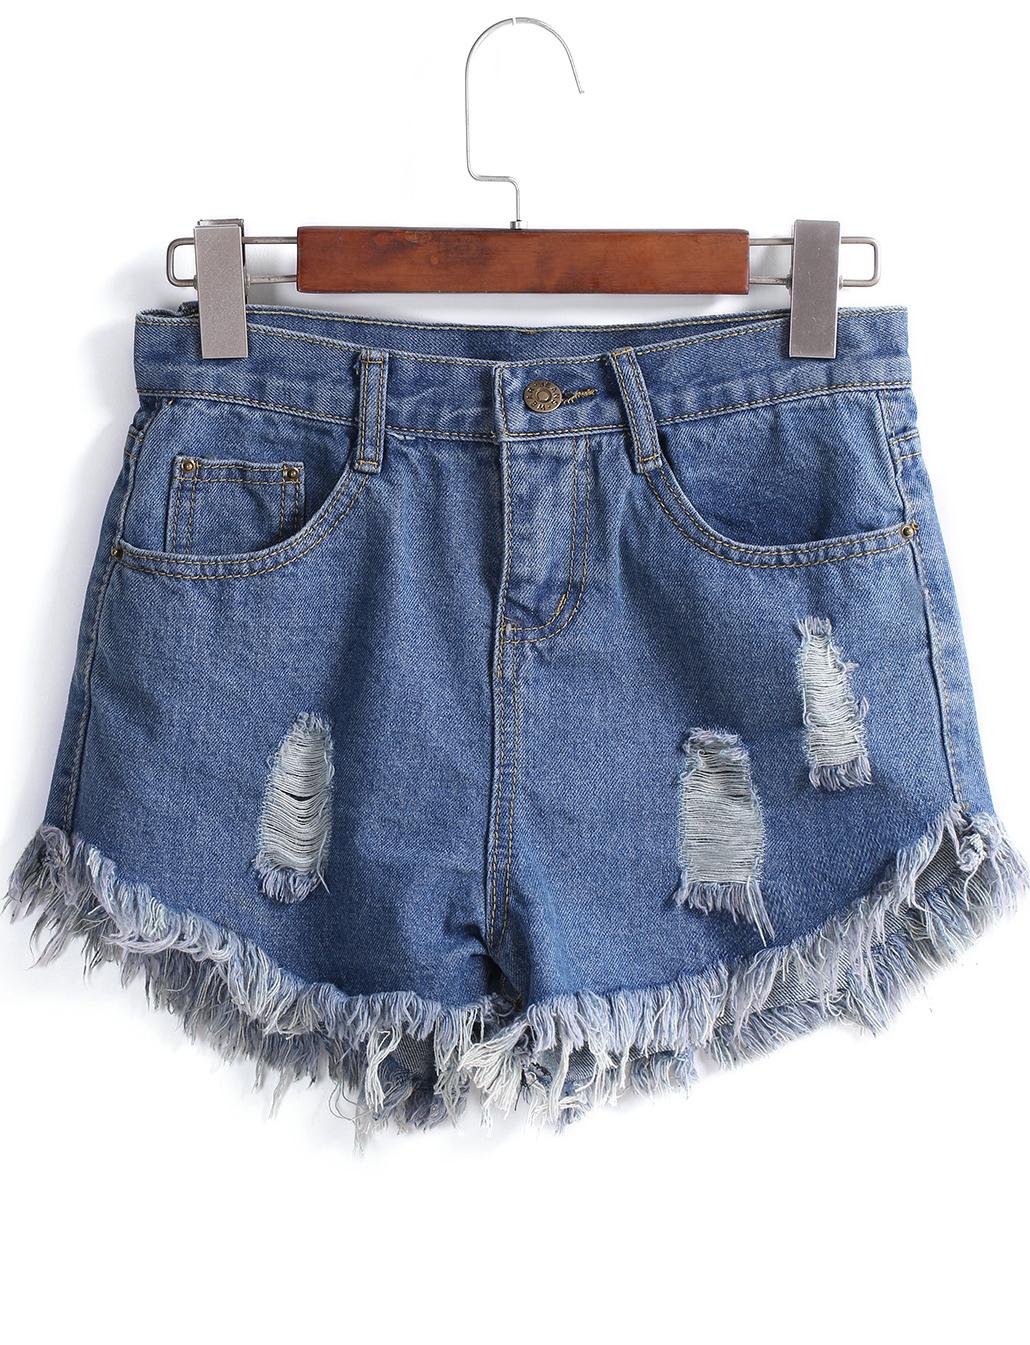 Fringe Ripped Denim Shorts - Sheinside.com